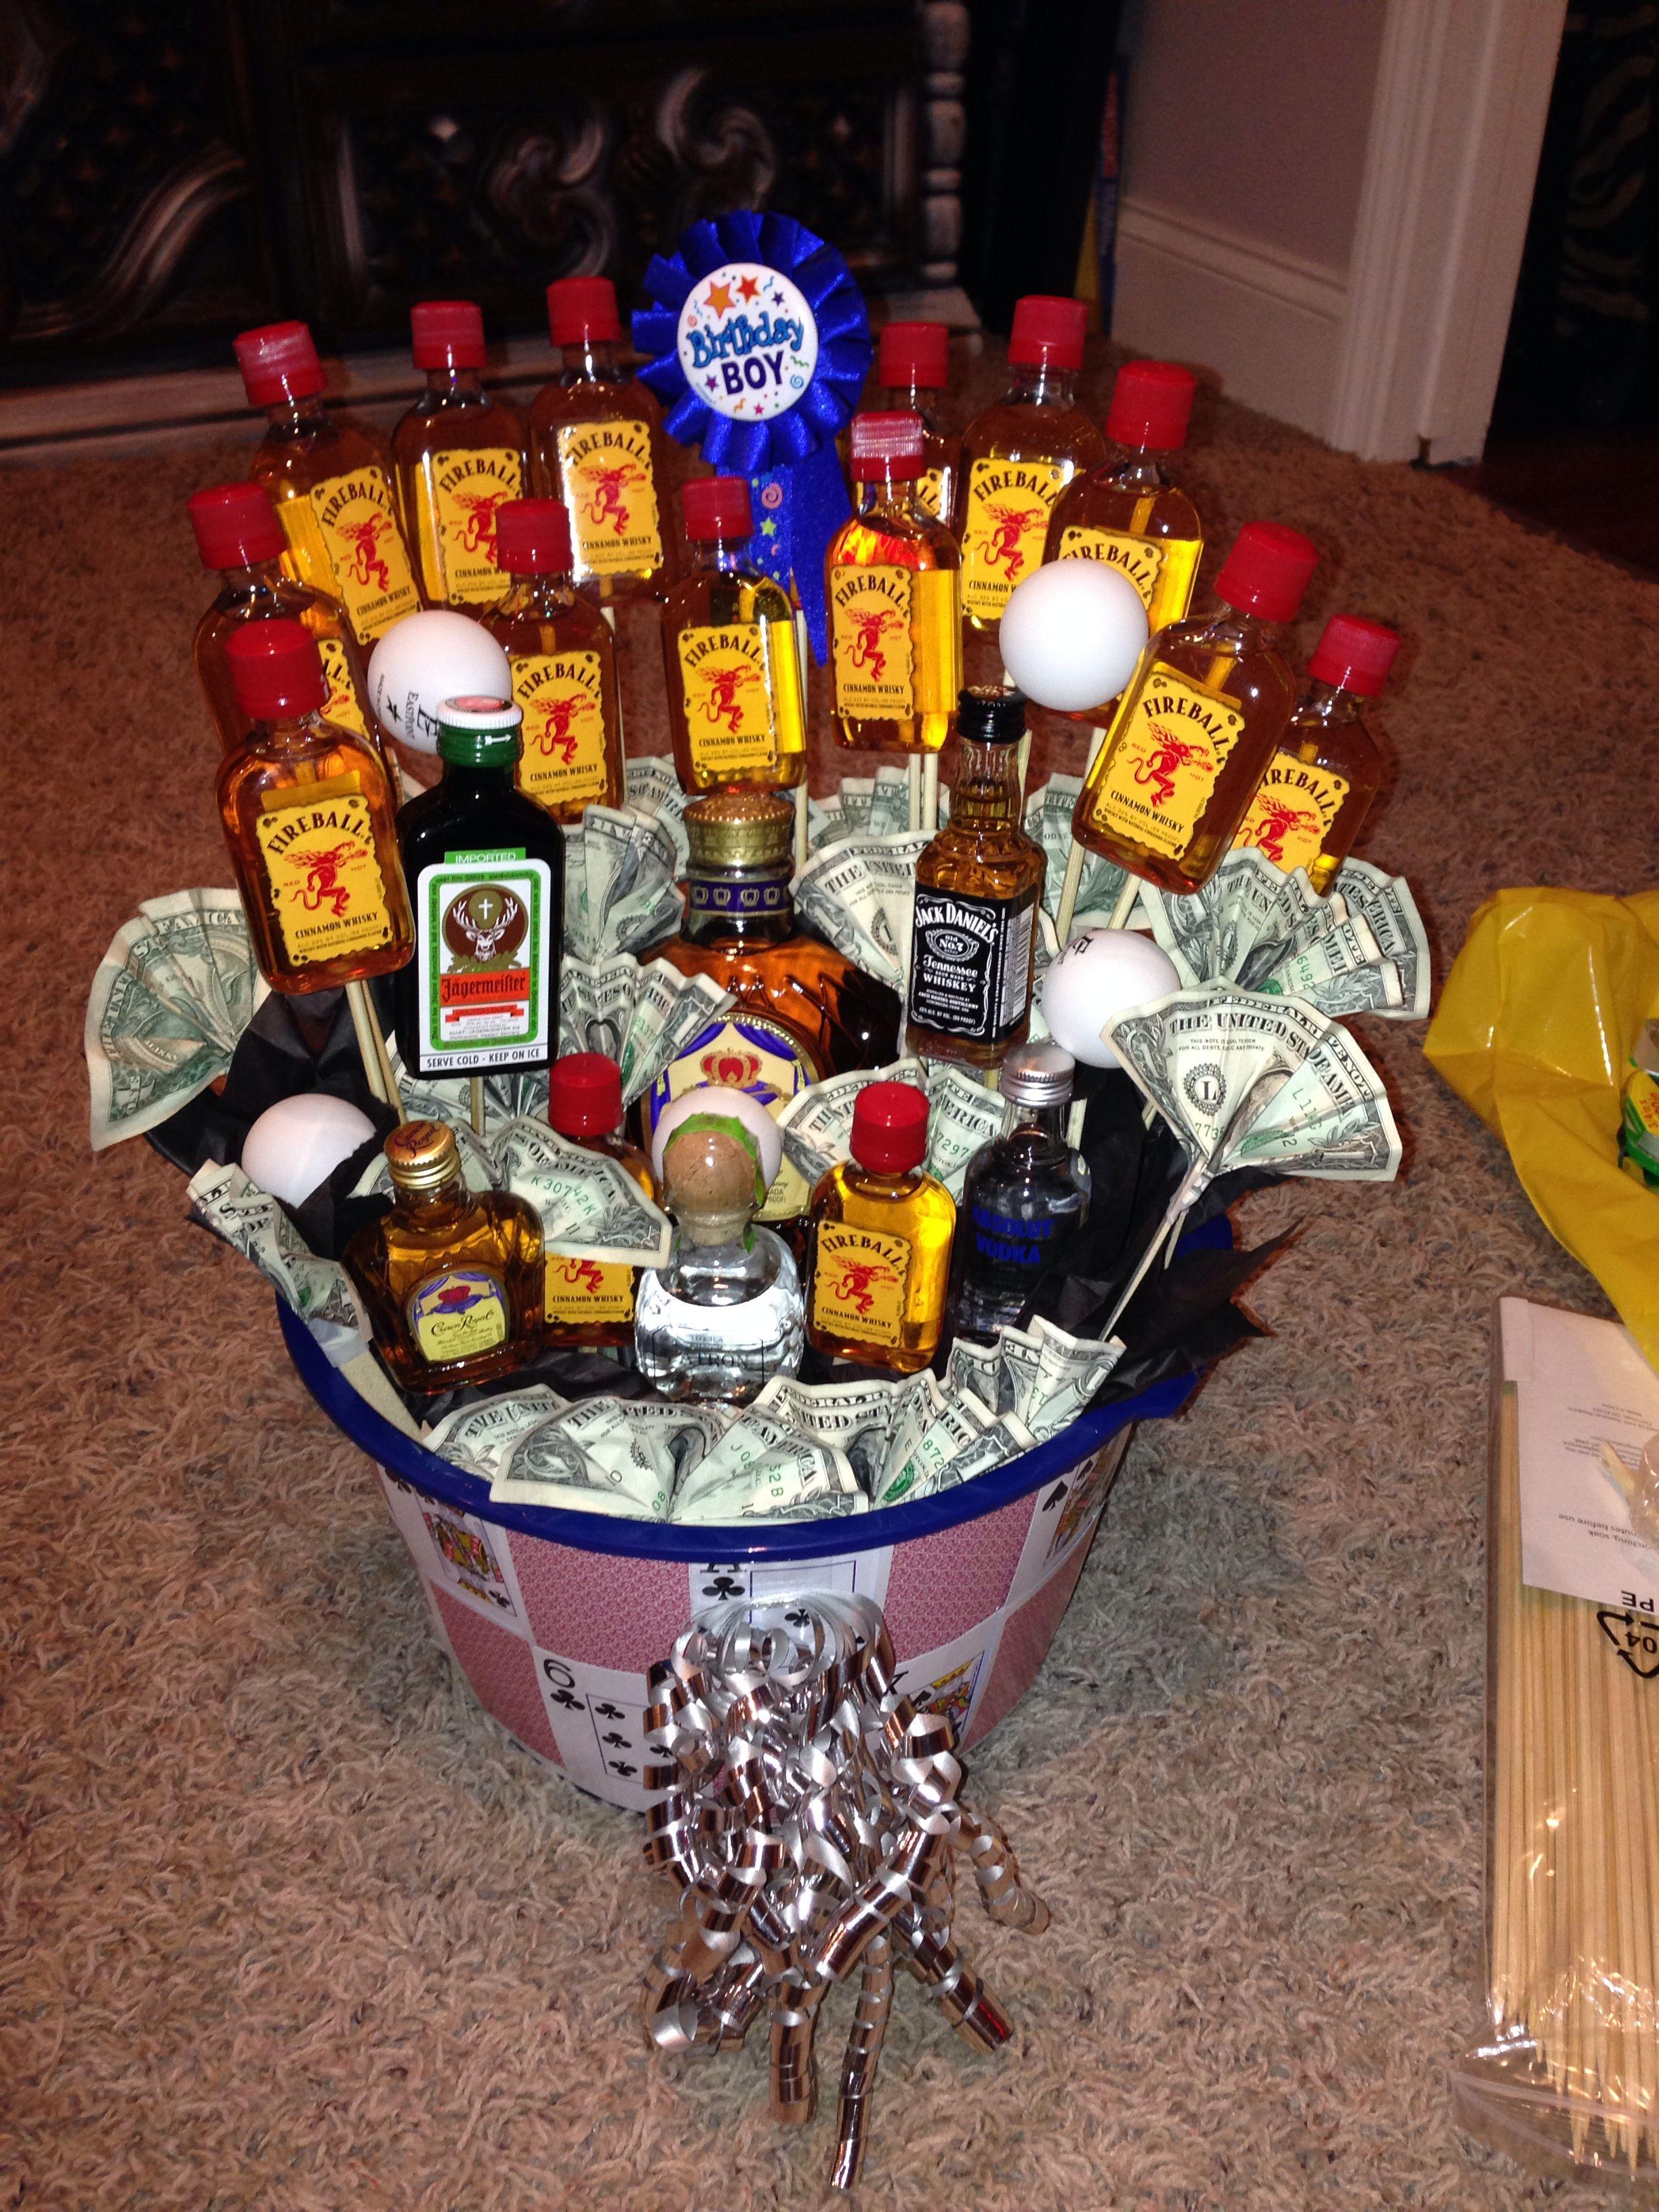 21st birthday basket for boyfriend!   DIY; get crafty ...